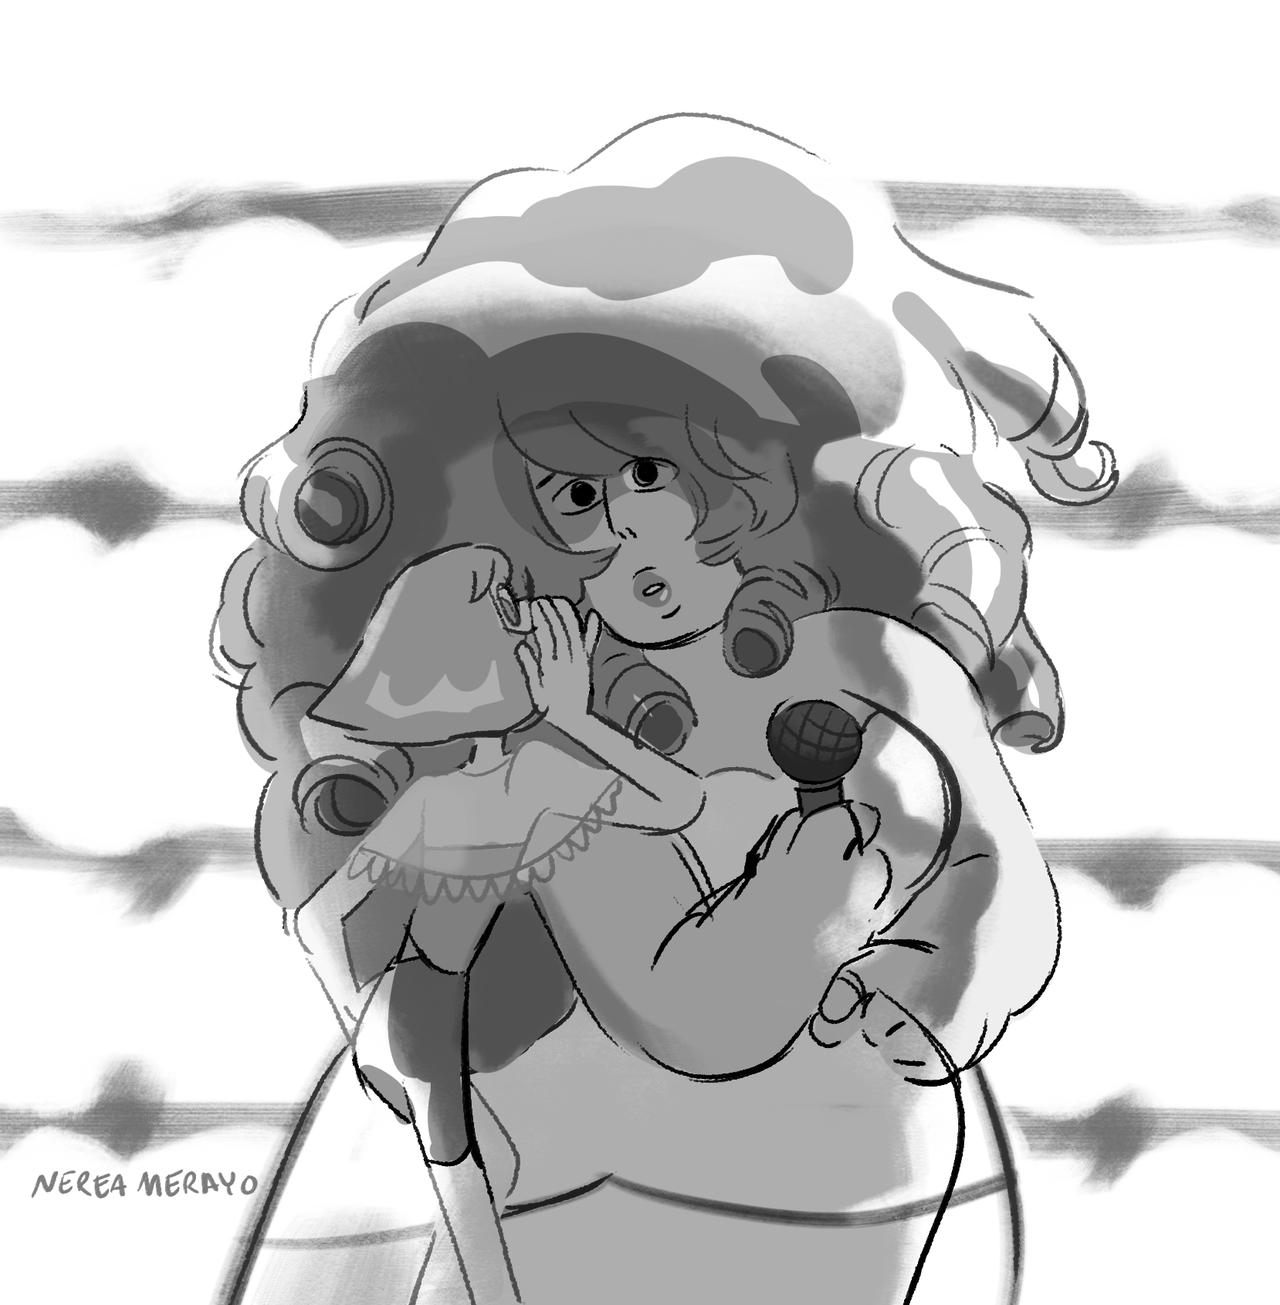 Nerea Merayo in 2020 Kawaii anime, Steven universe, Anime